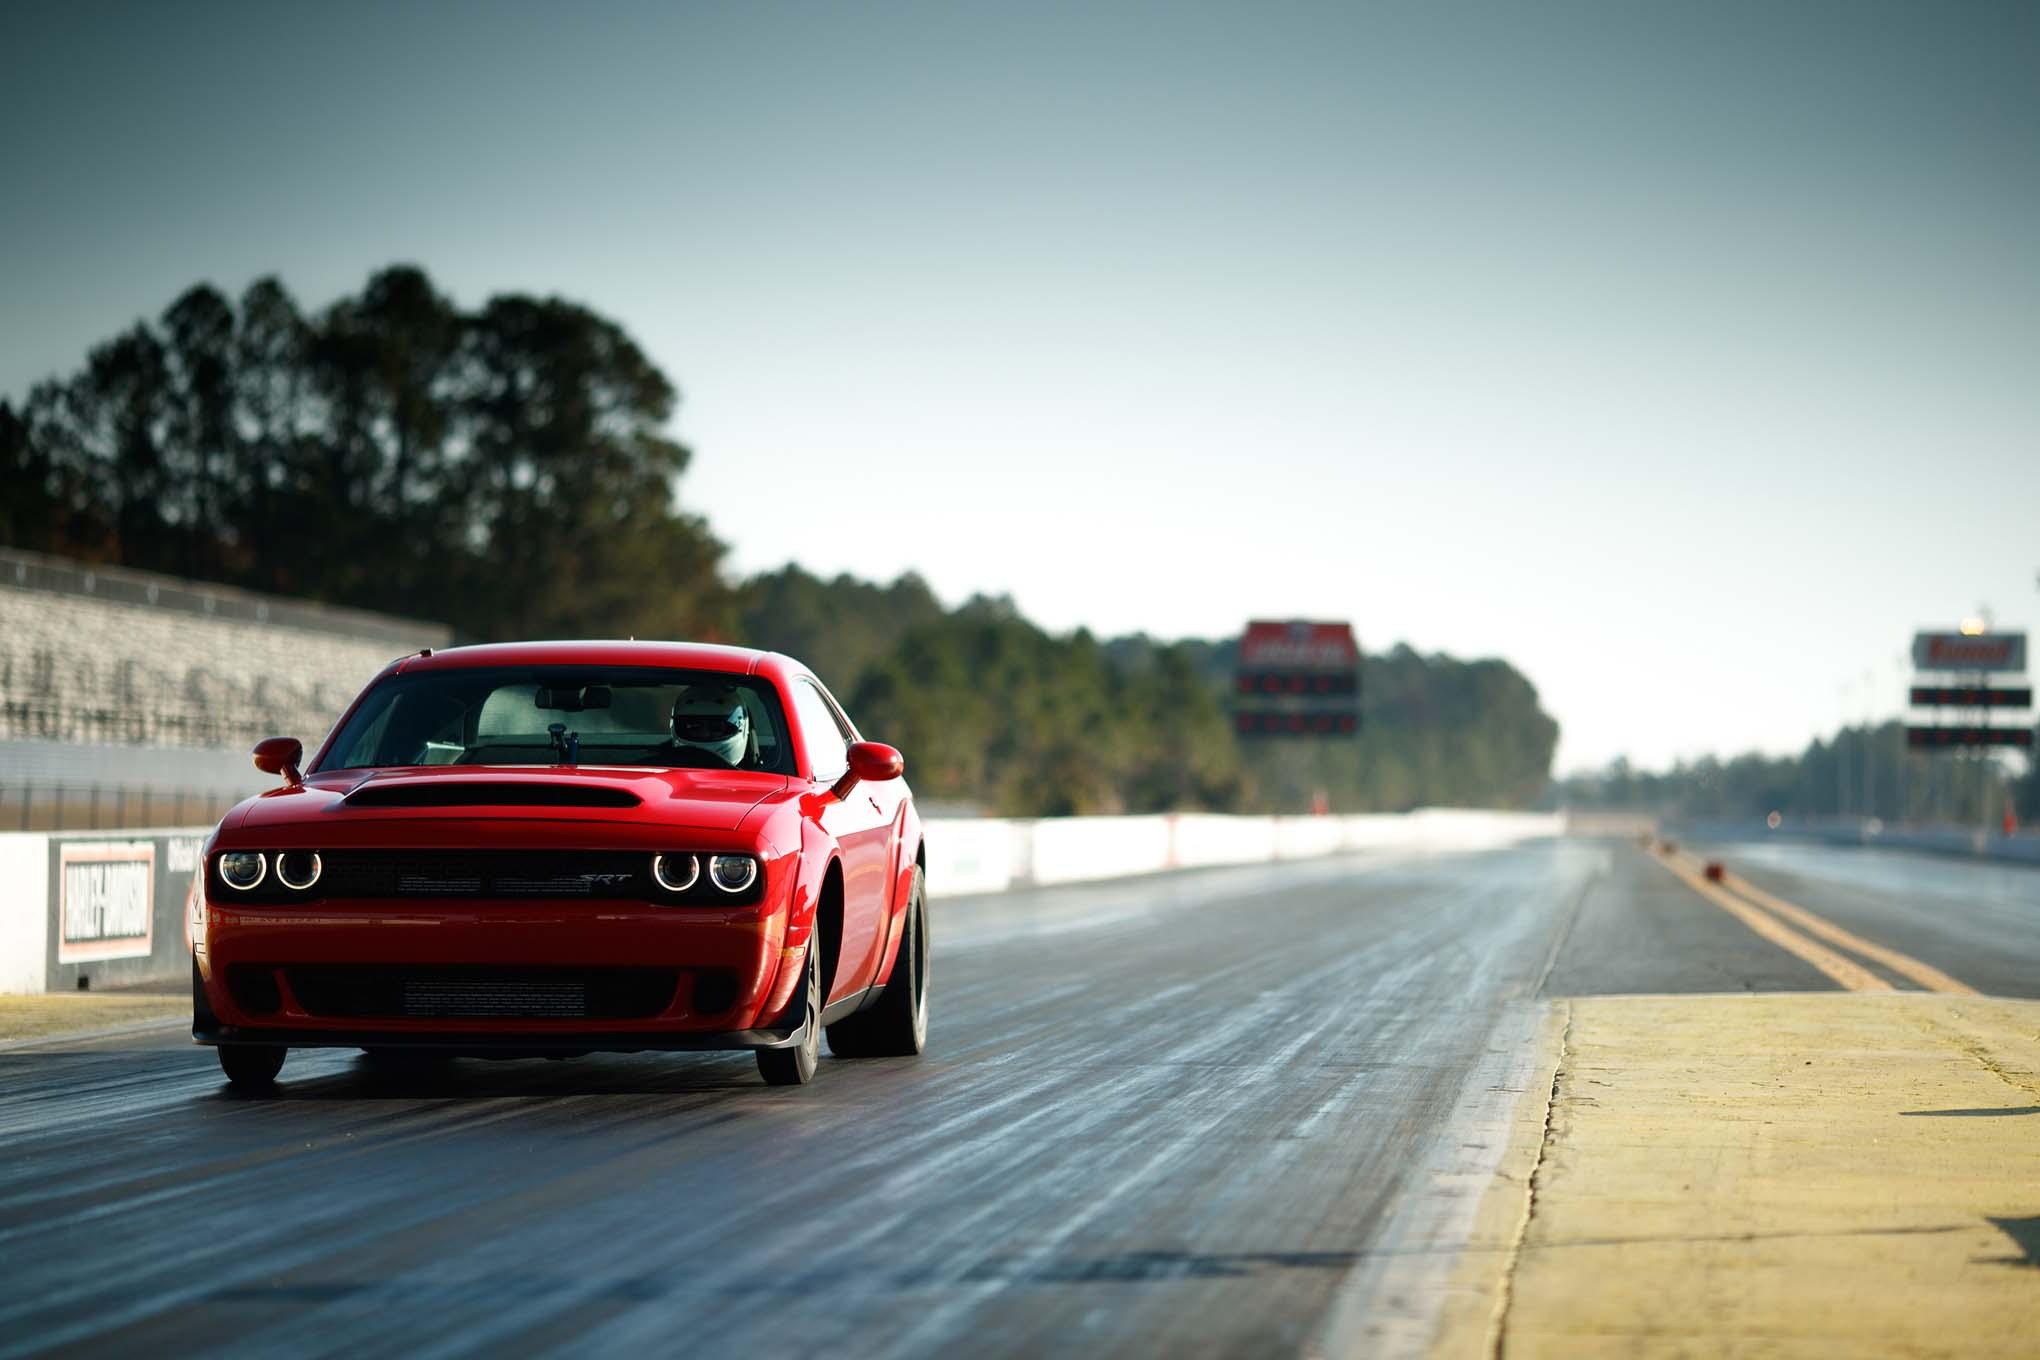 Car Dodge Dodge Challenger Dodge Challenger Srt Dodge Challenger Srt Demon Mopar Muscle Car Vehicle 2040x1360